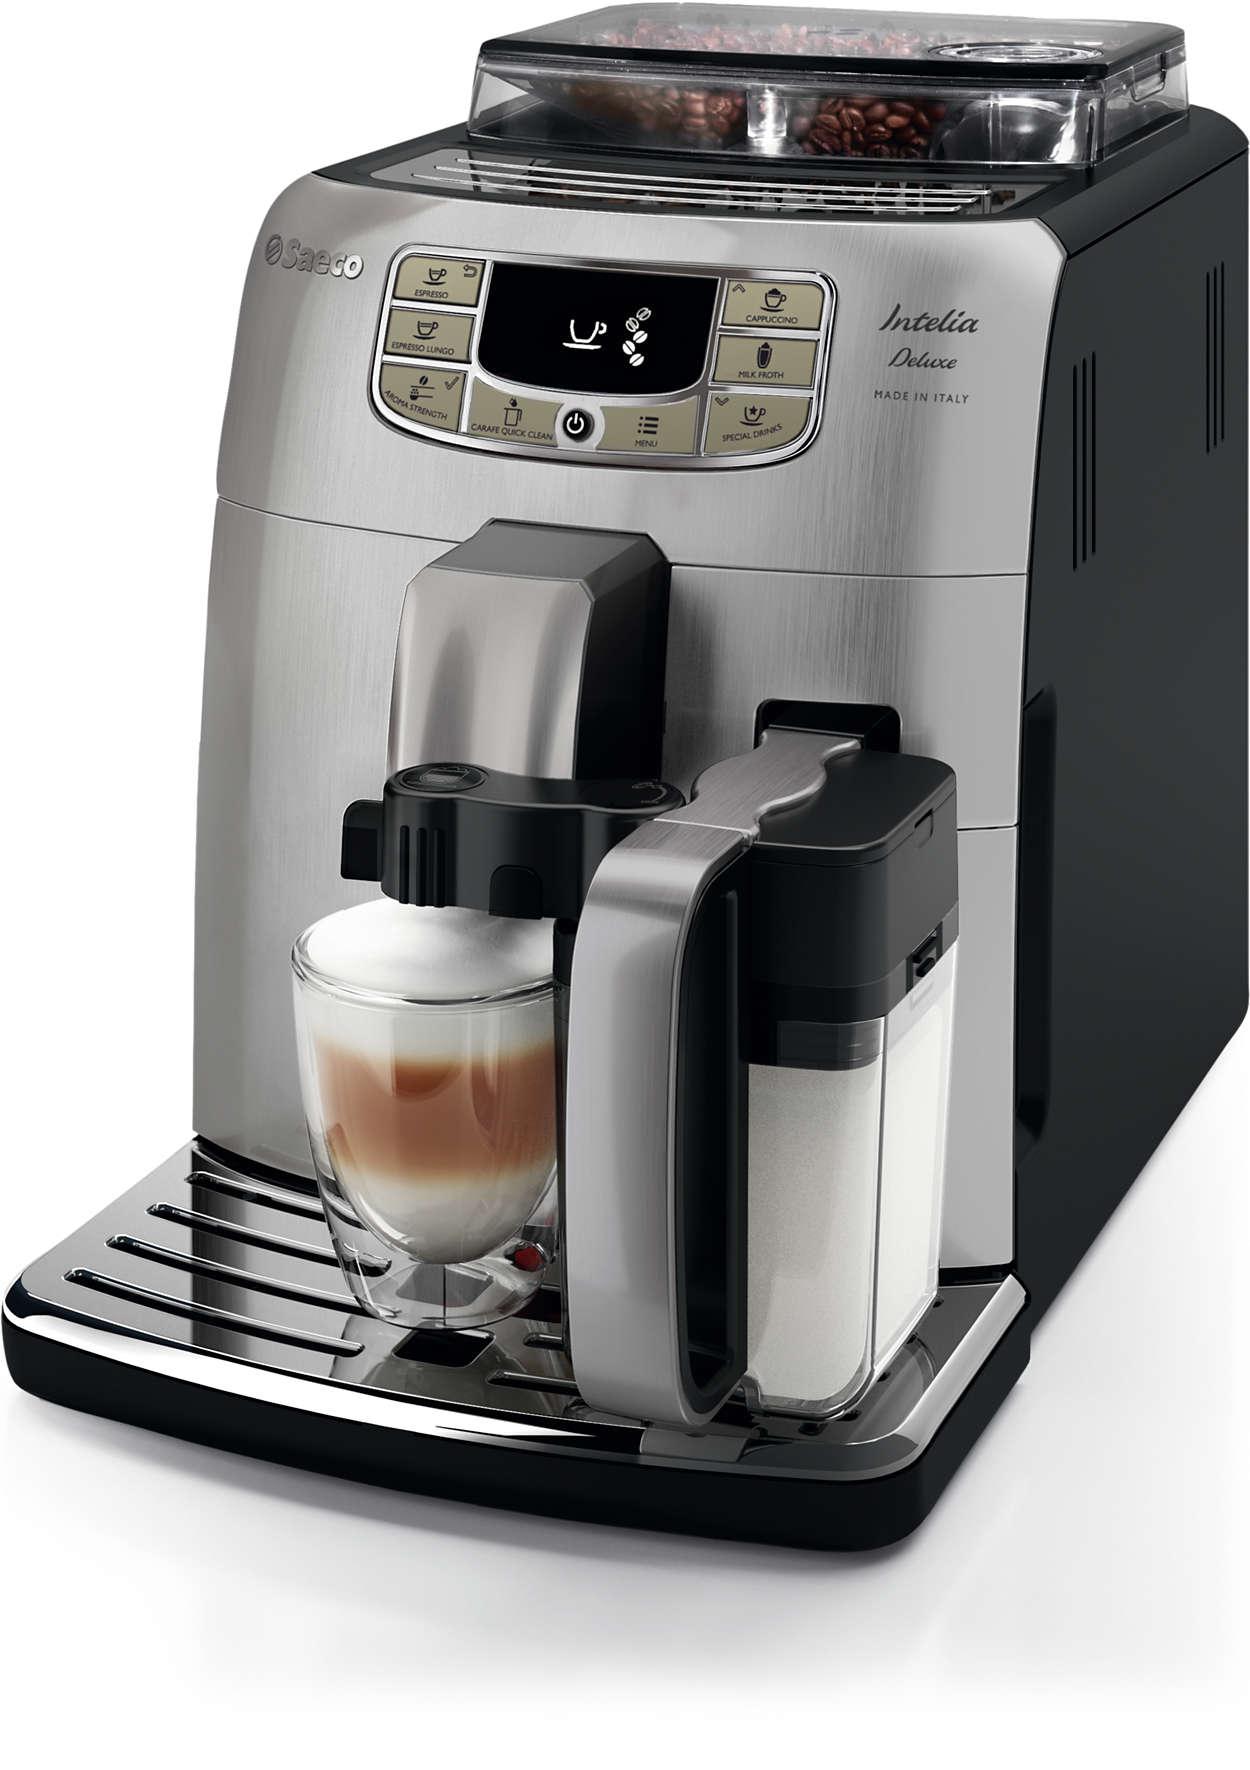 Saeco Intelia DELUXE One Touch Cappuccino Espresso Machine HD8771/93 OPEN BOX - IN STORE PURCHASE ONLY